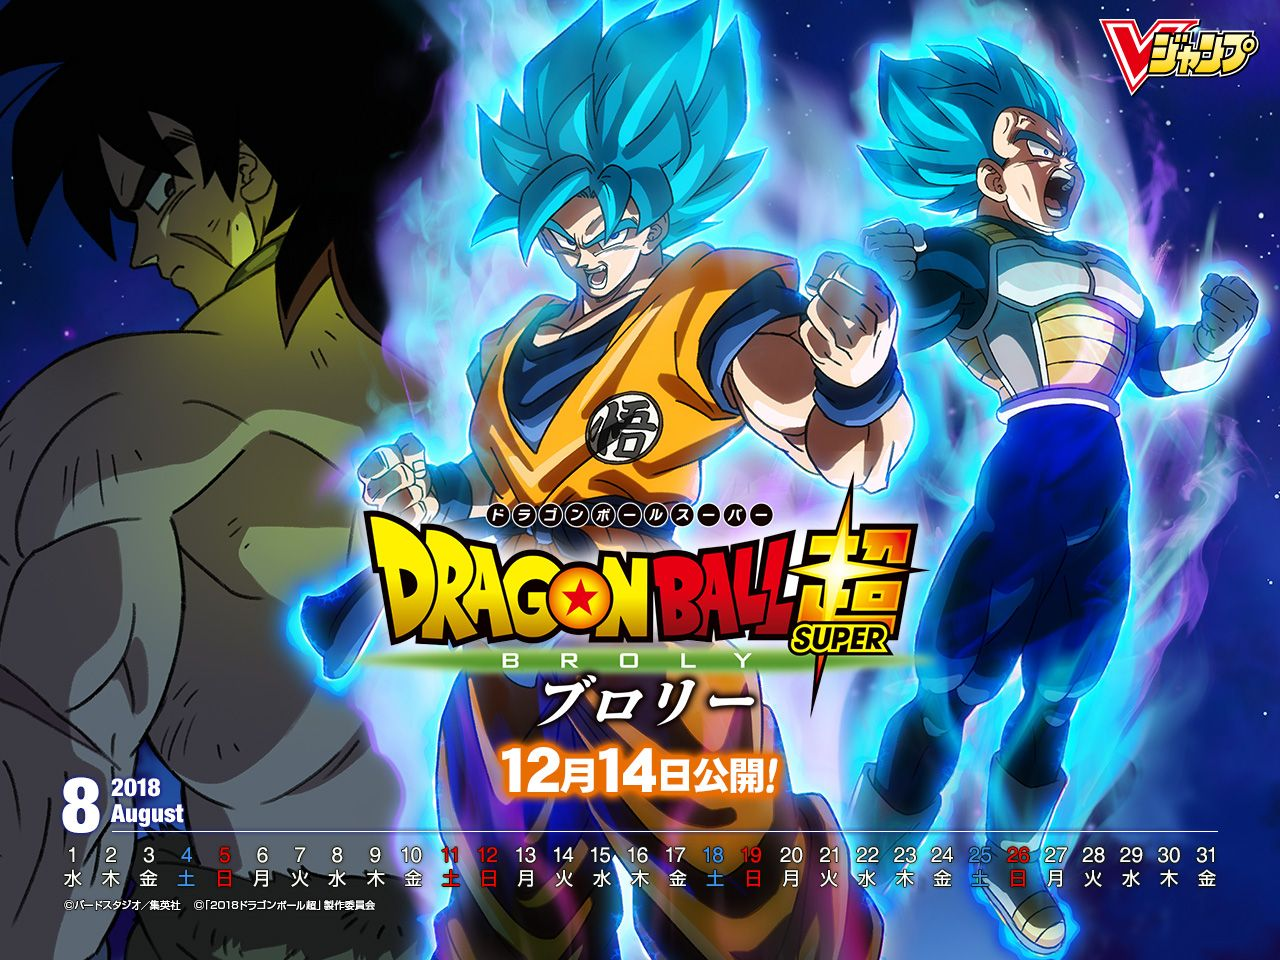 Dragon Ball Super Broly Wallpapers Top Free Dragon Ball Super